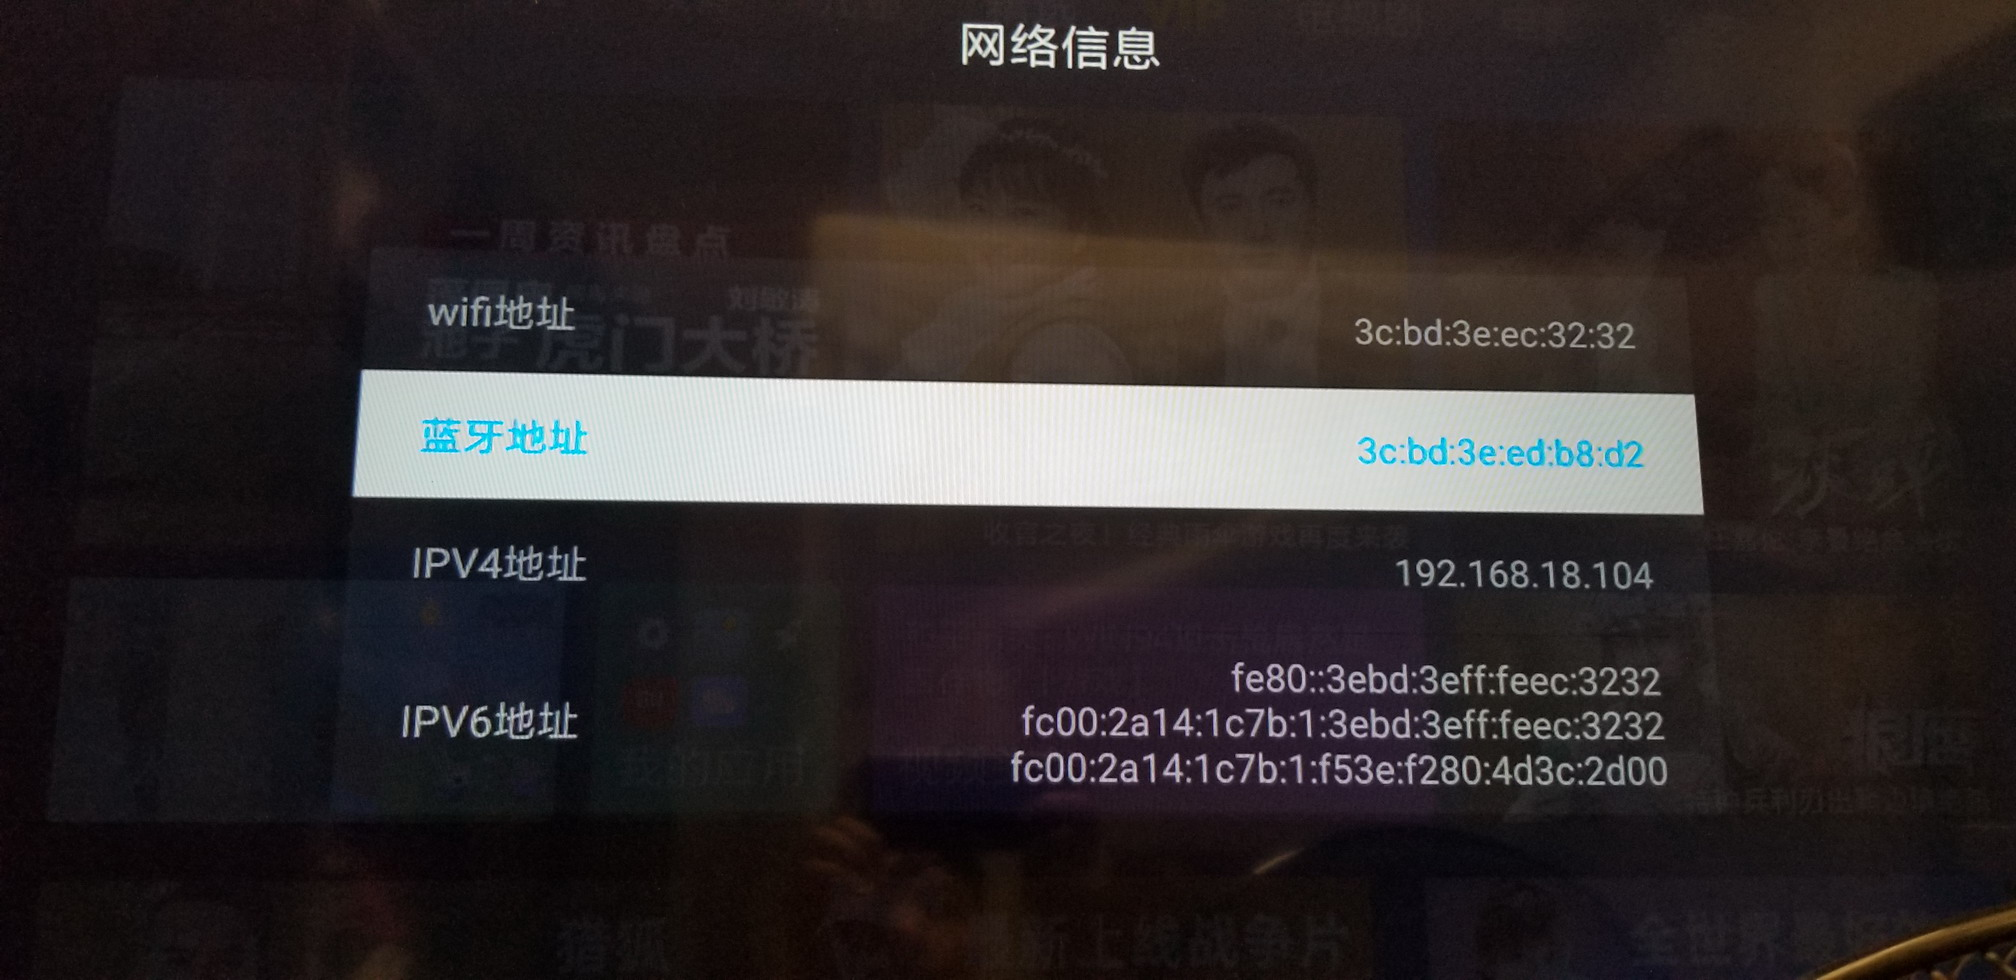 小米盒子/安卓电视 免root免破解一键精简安装Aptoide AndroidTV 看Youtube油管 Netflix奈飞